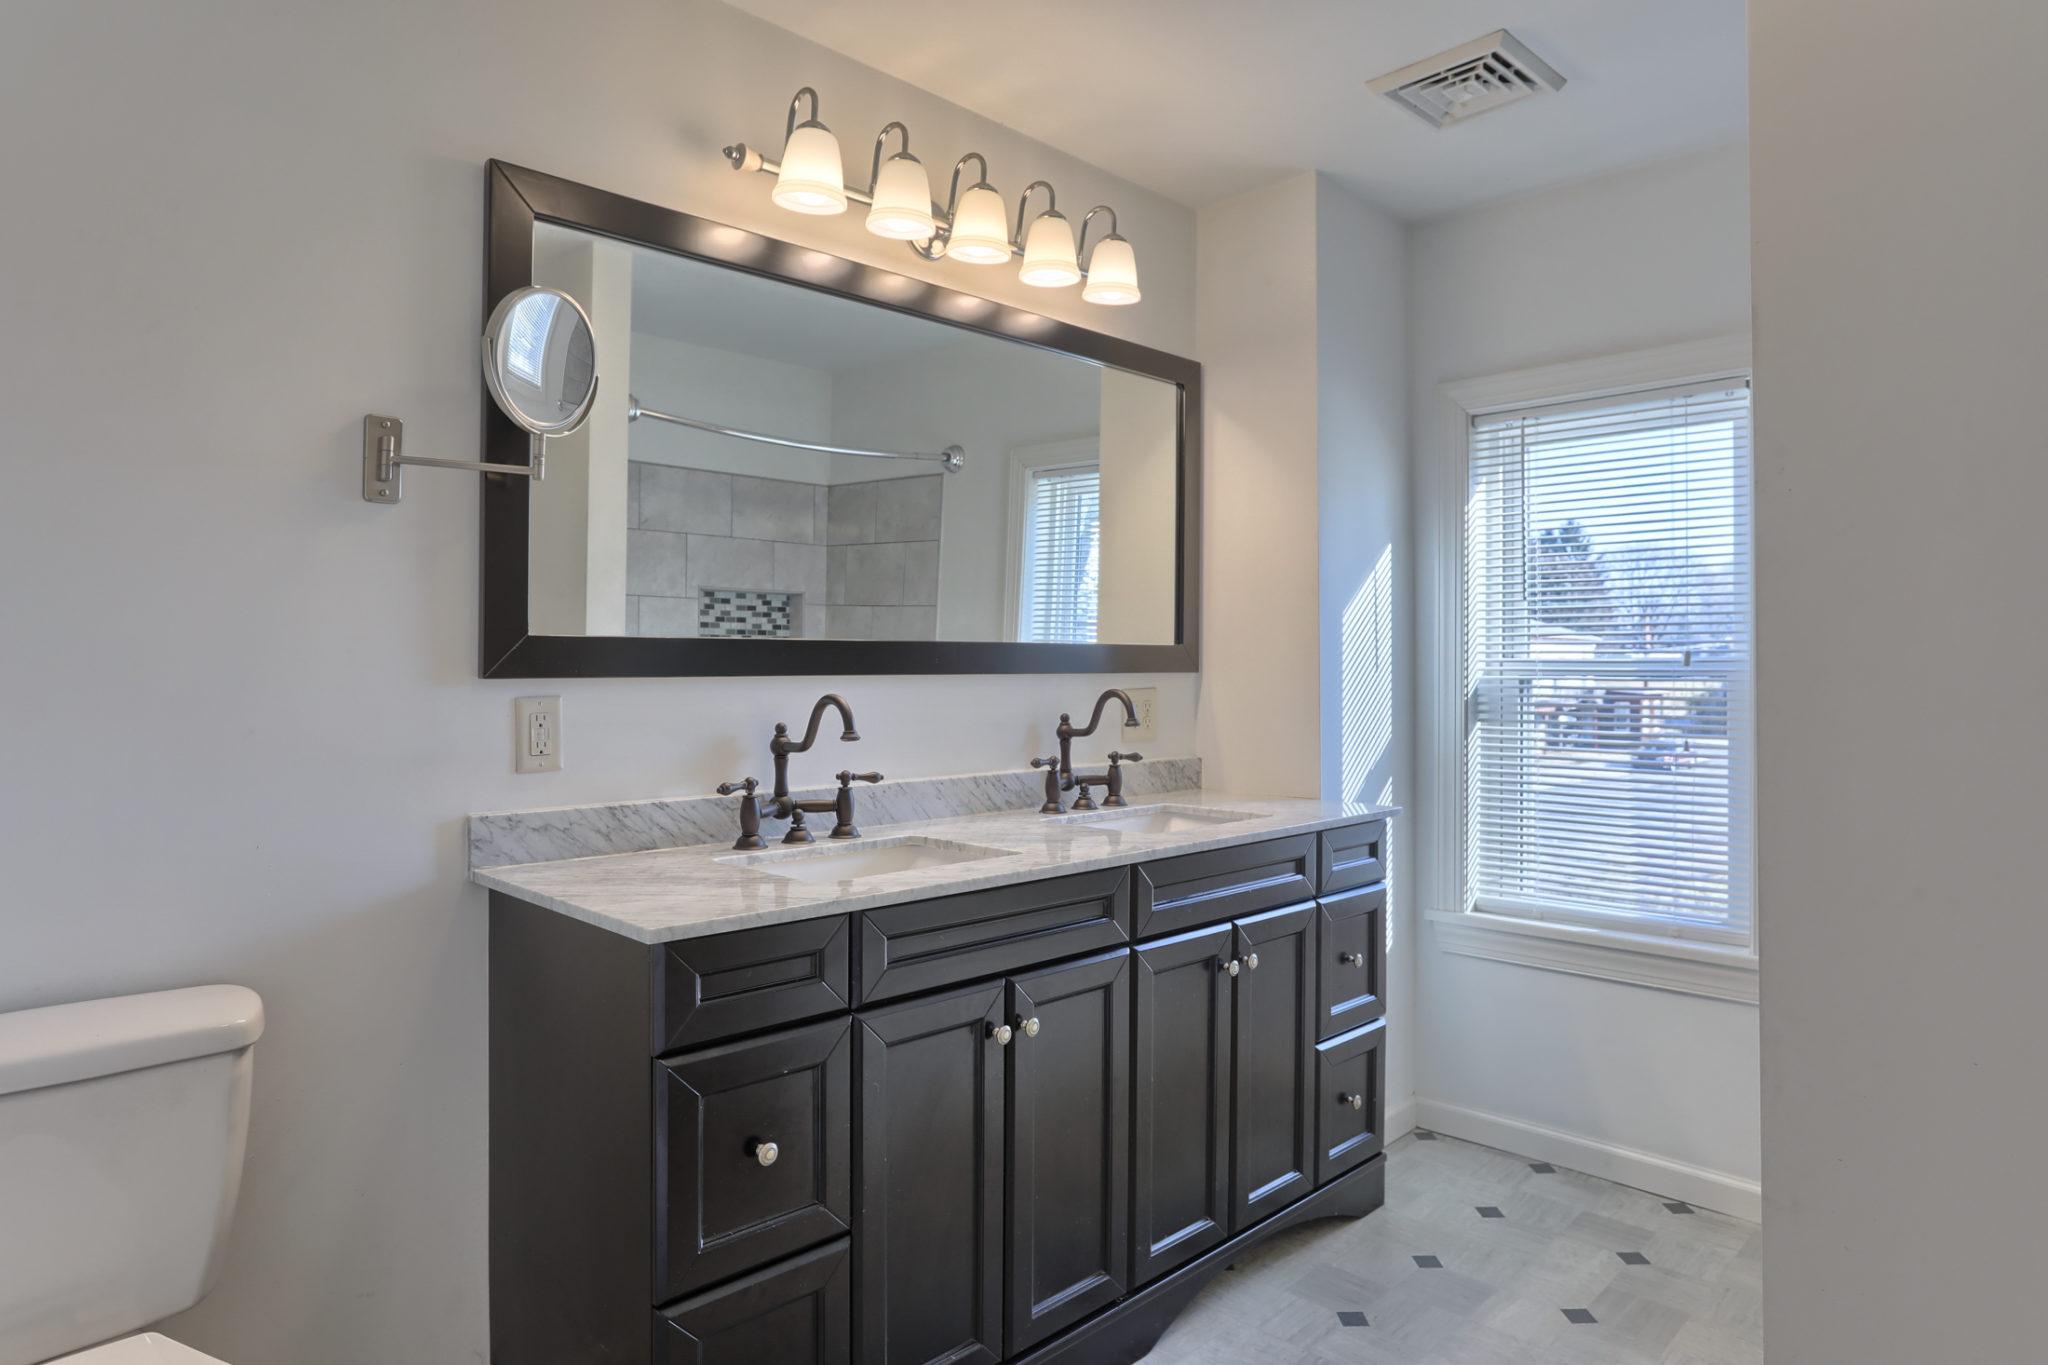 12 E. Center Ave. - Bathroom